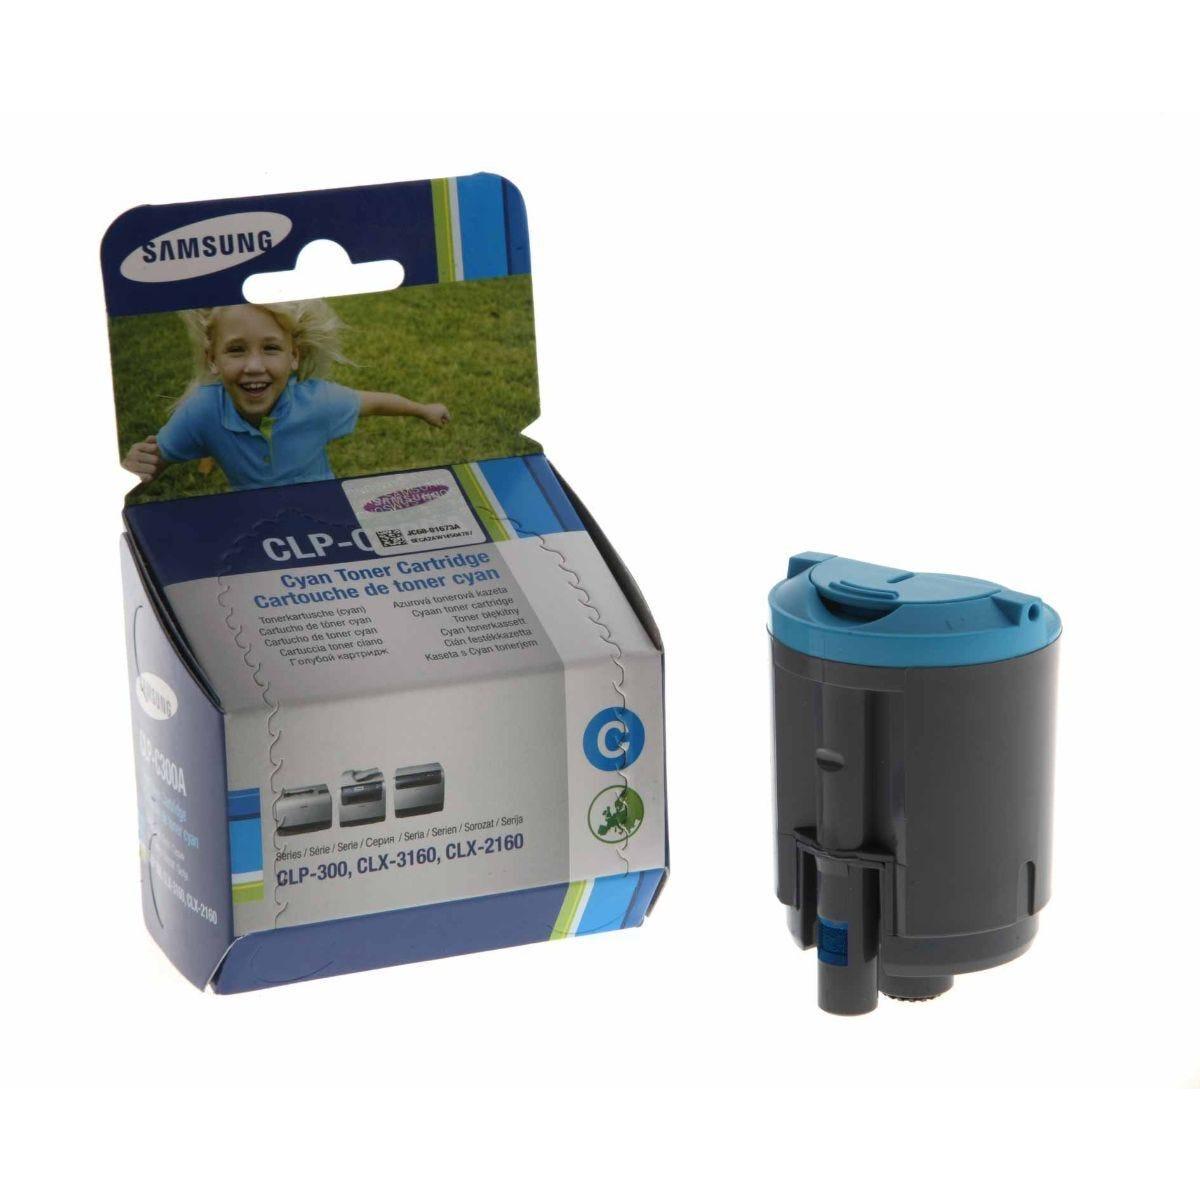 Samsung CLP-C300A Laser Printer Ink Toner Cartridge